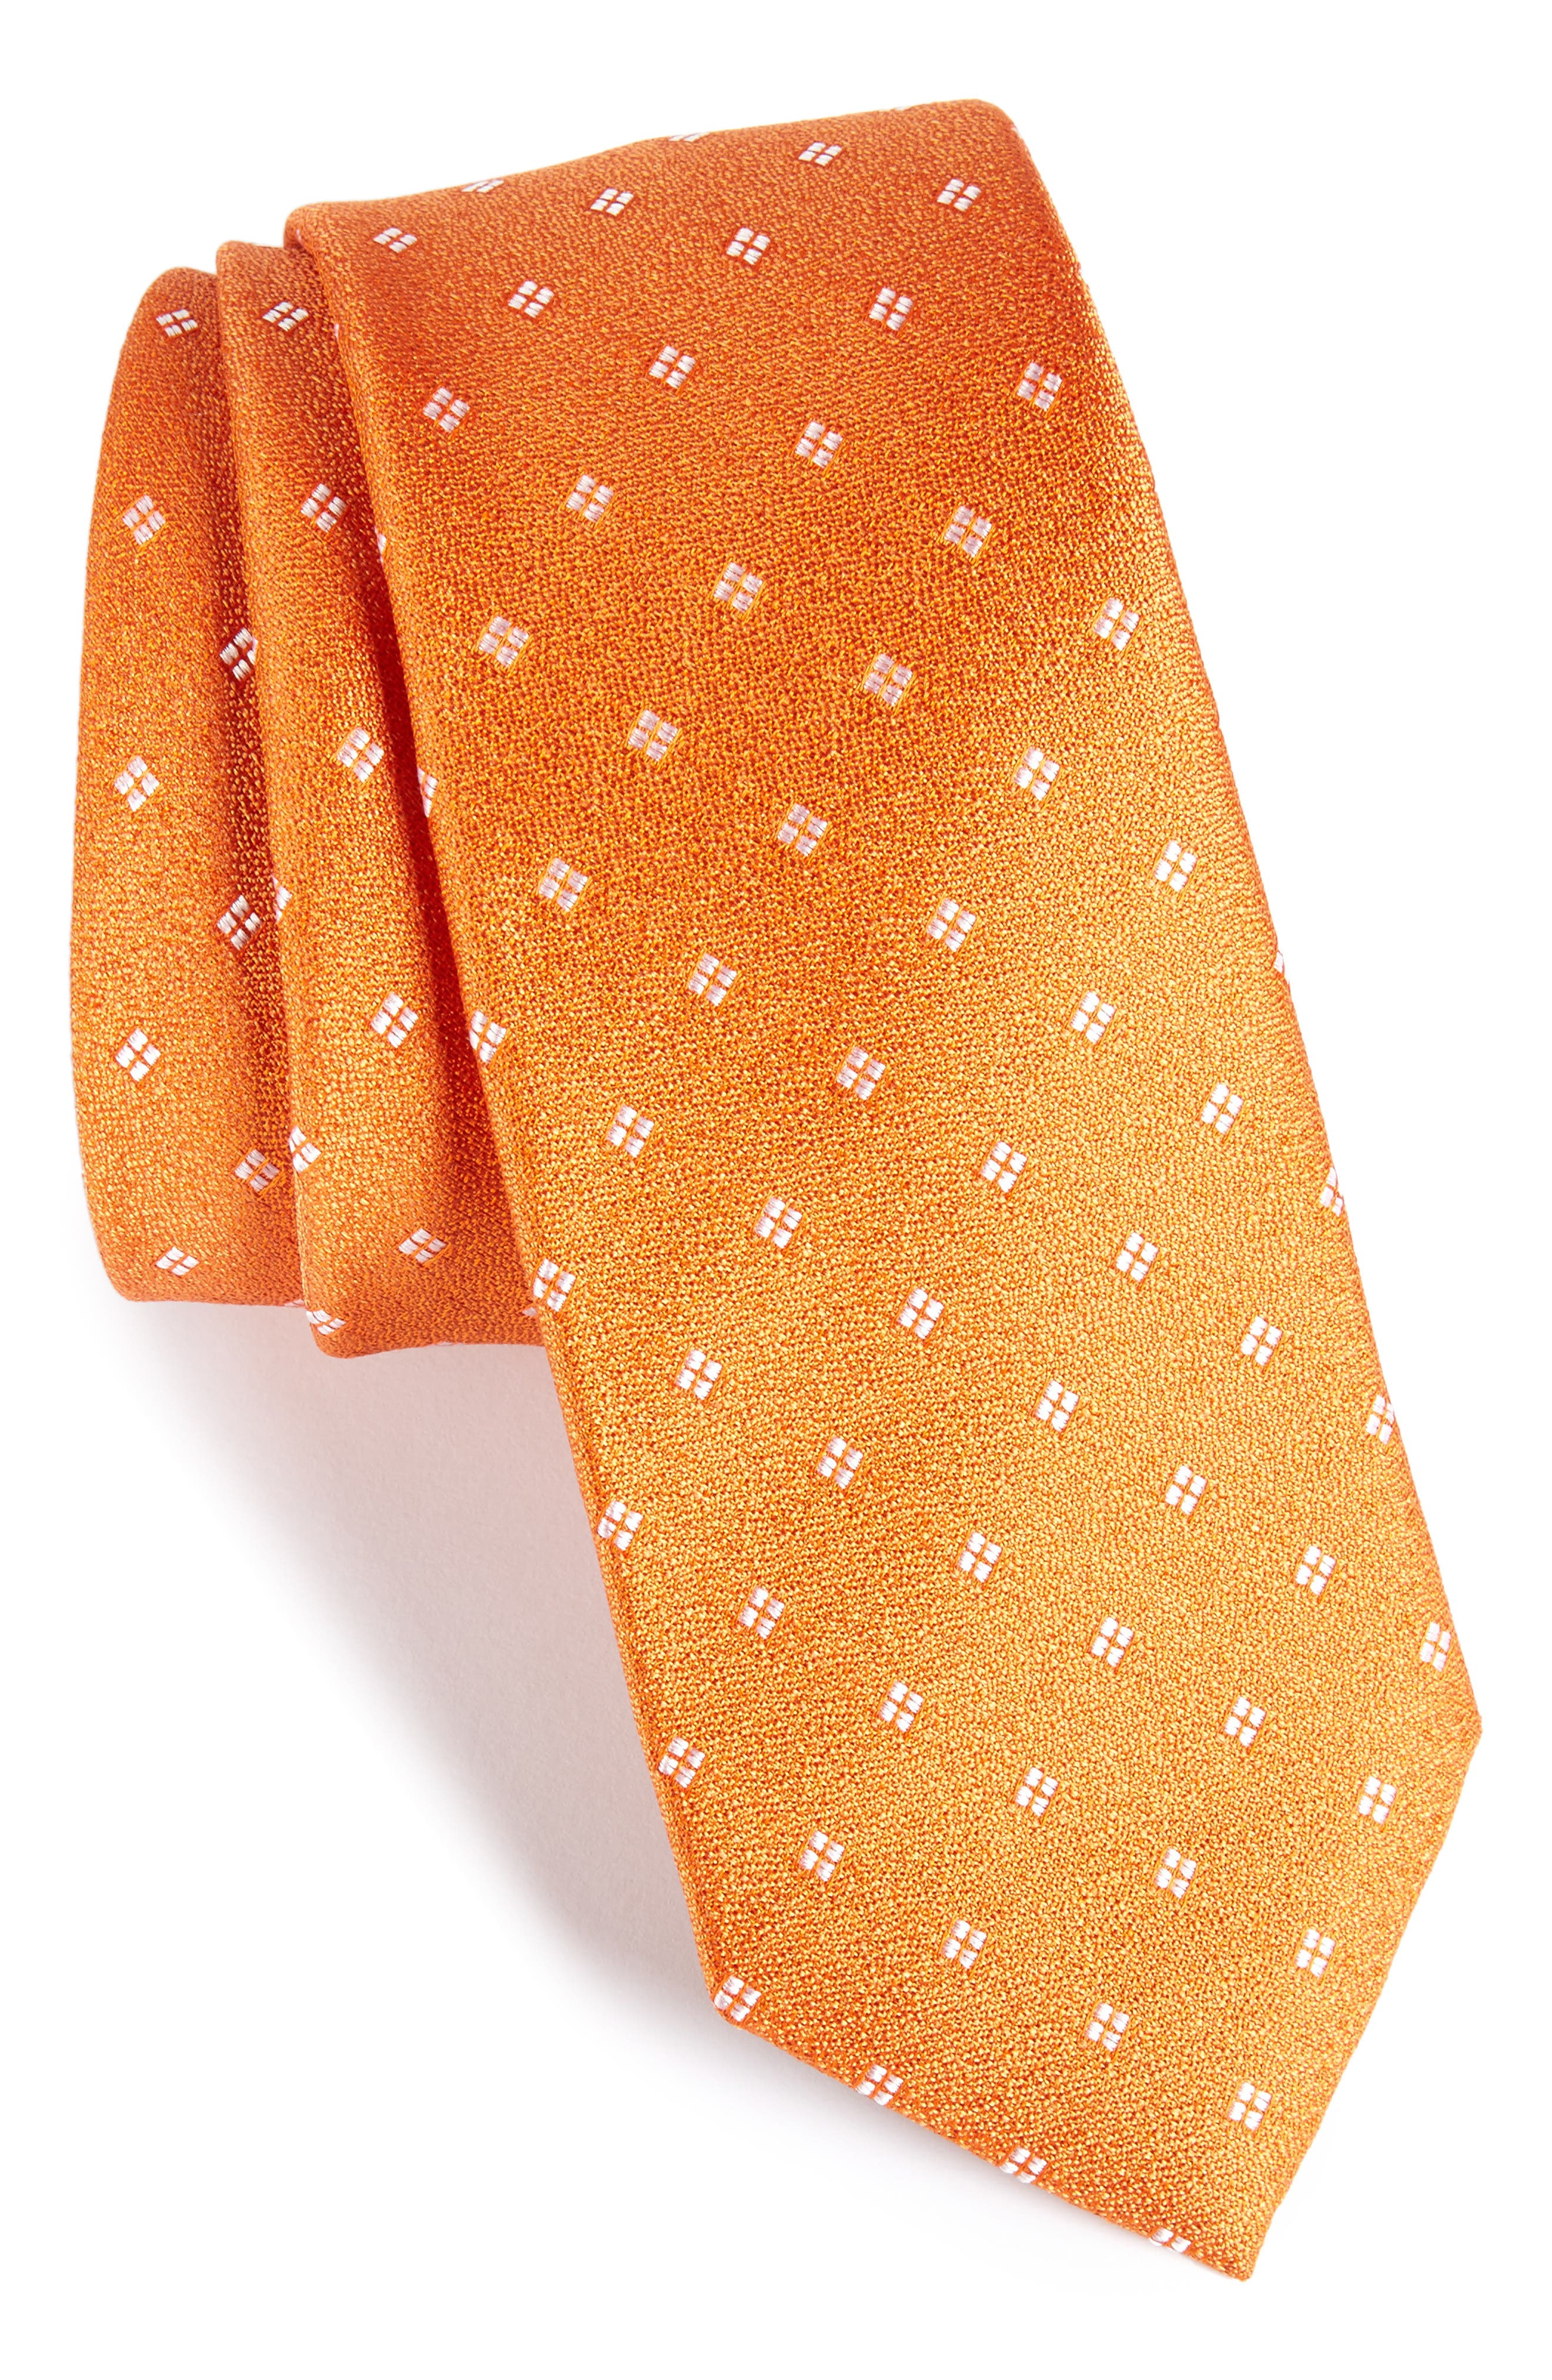 Moten Neat Silk Skinny Tie,                         Main,                         color, Orange